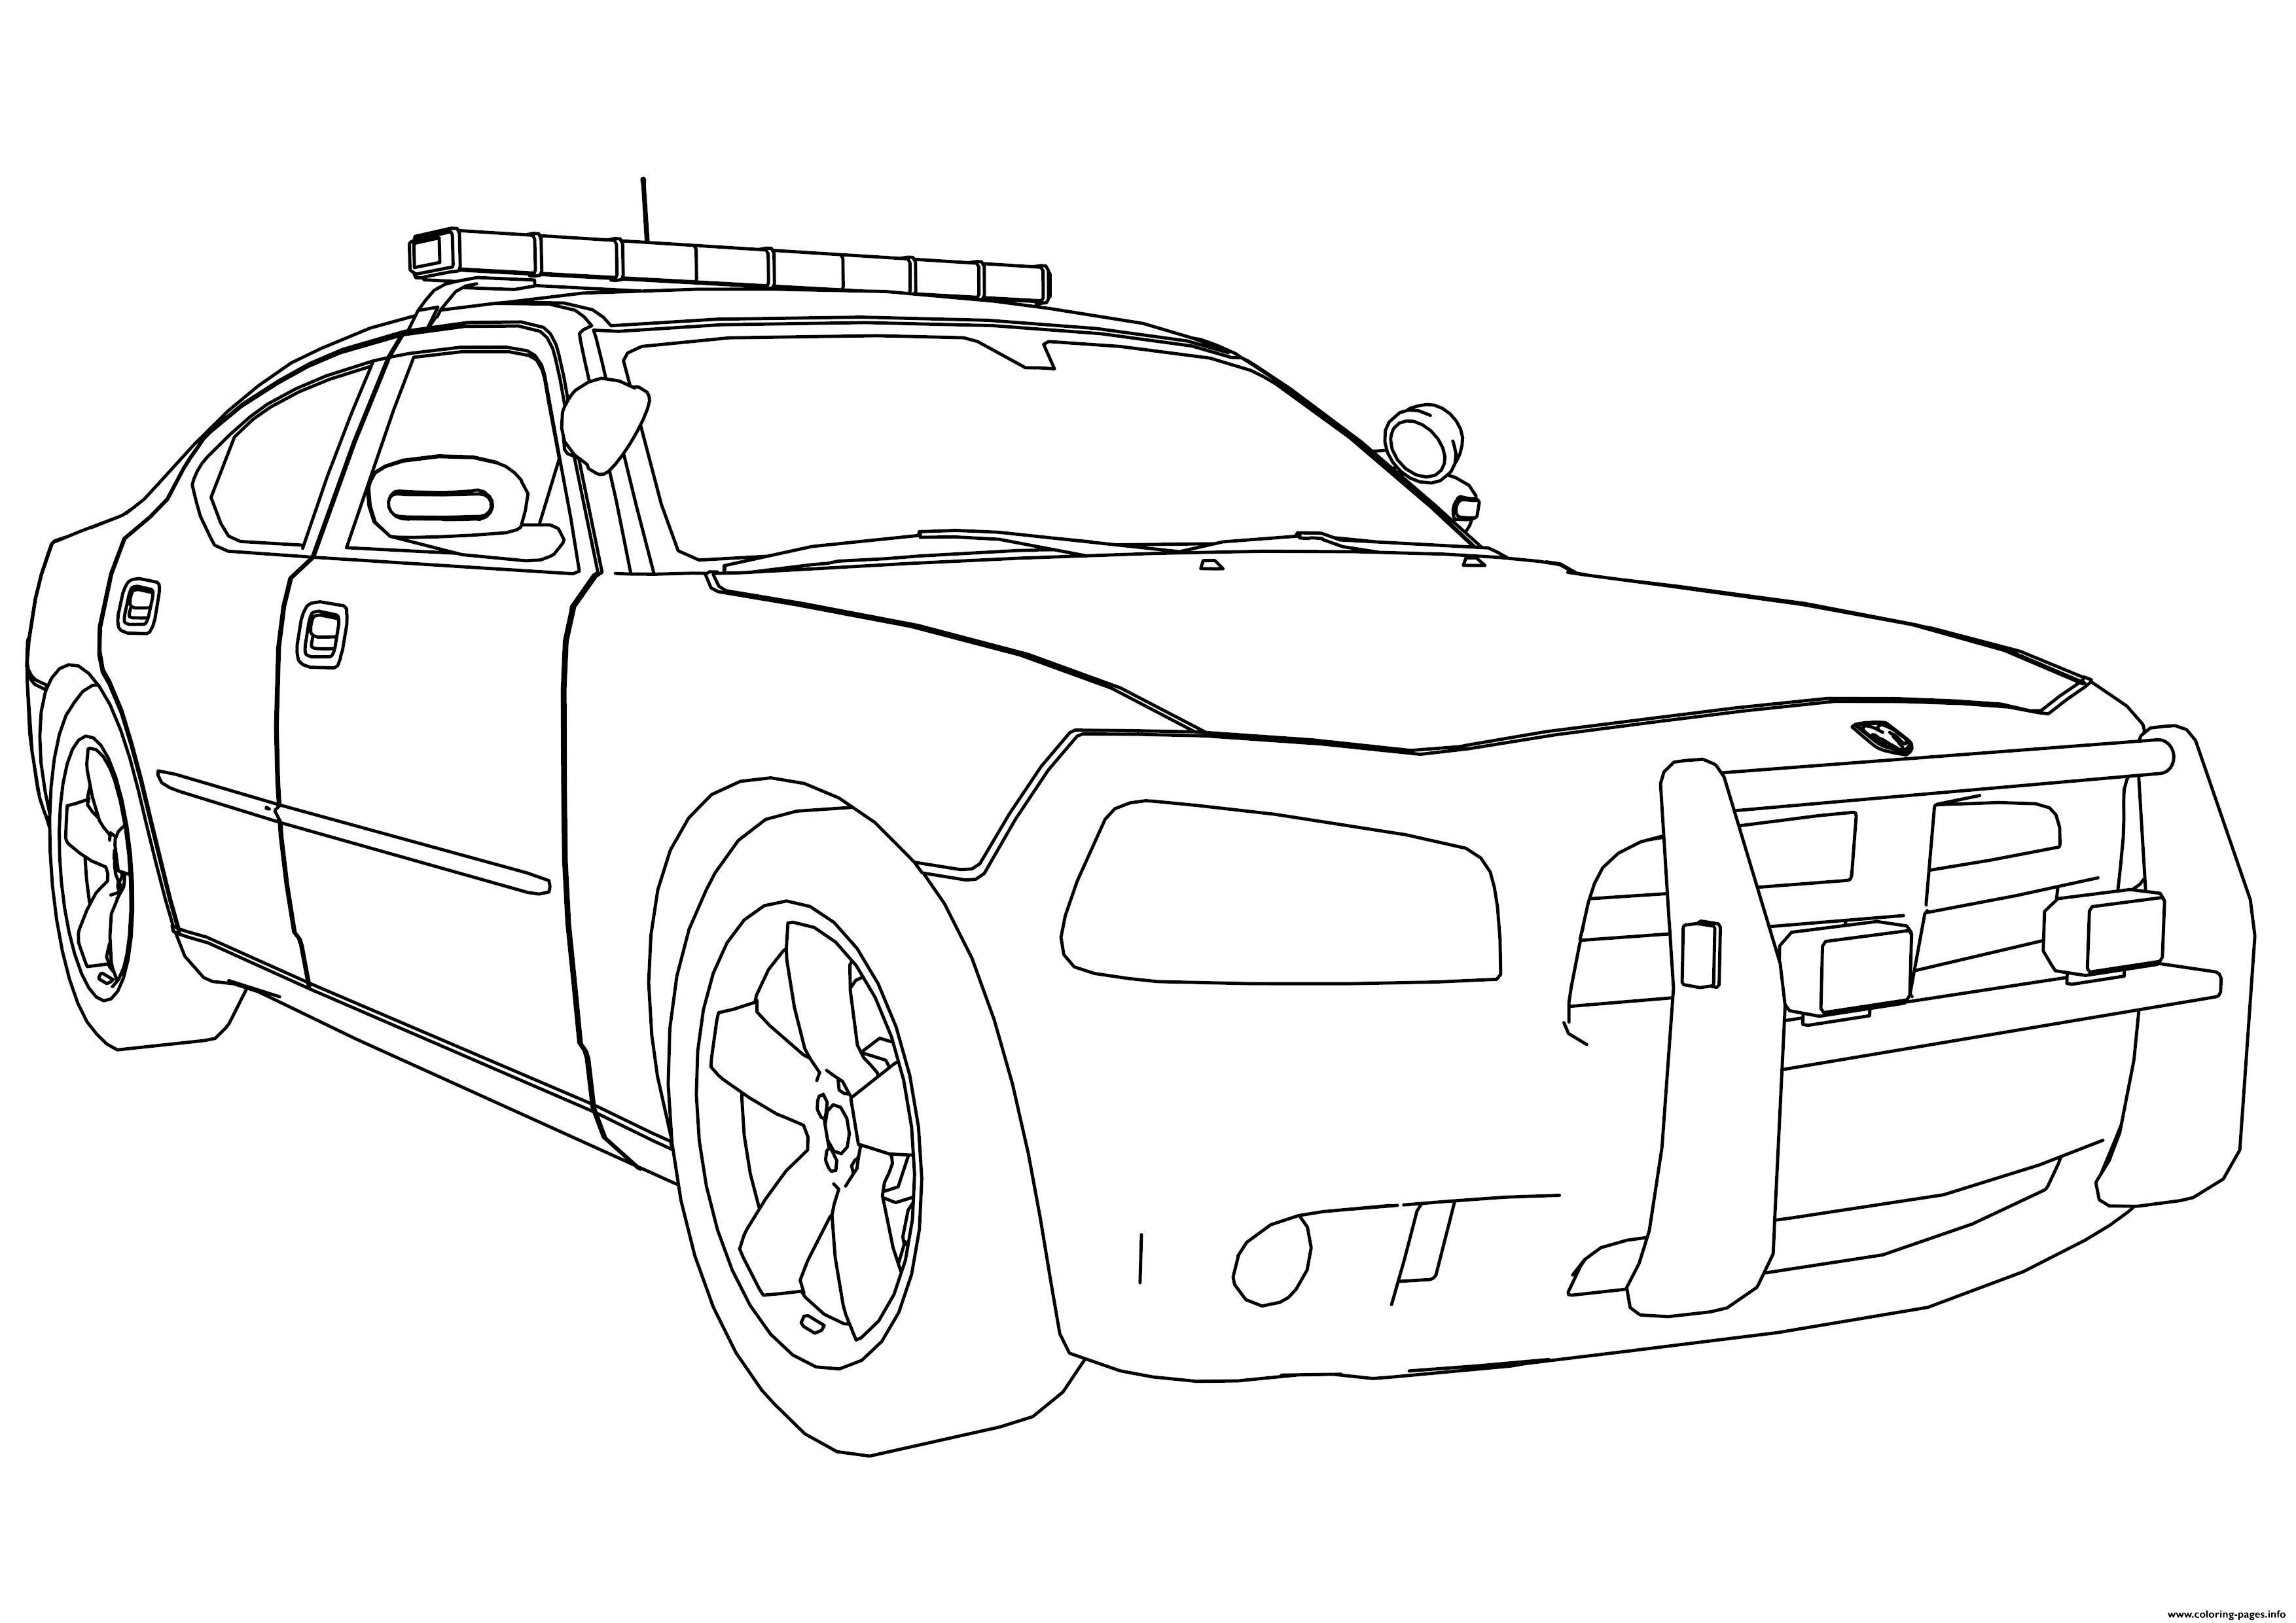 3508x2480 Dodge Charger Coloring Pages Get Bubbles